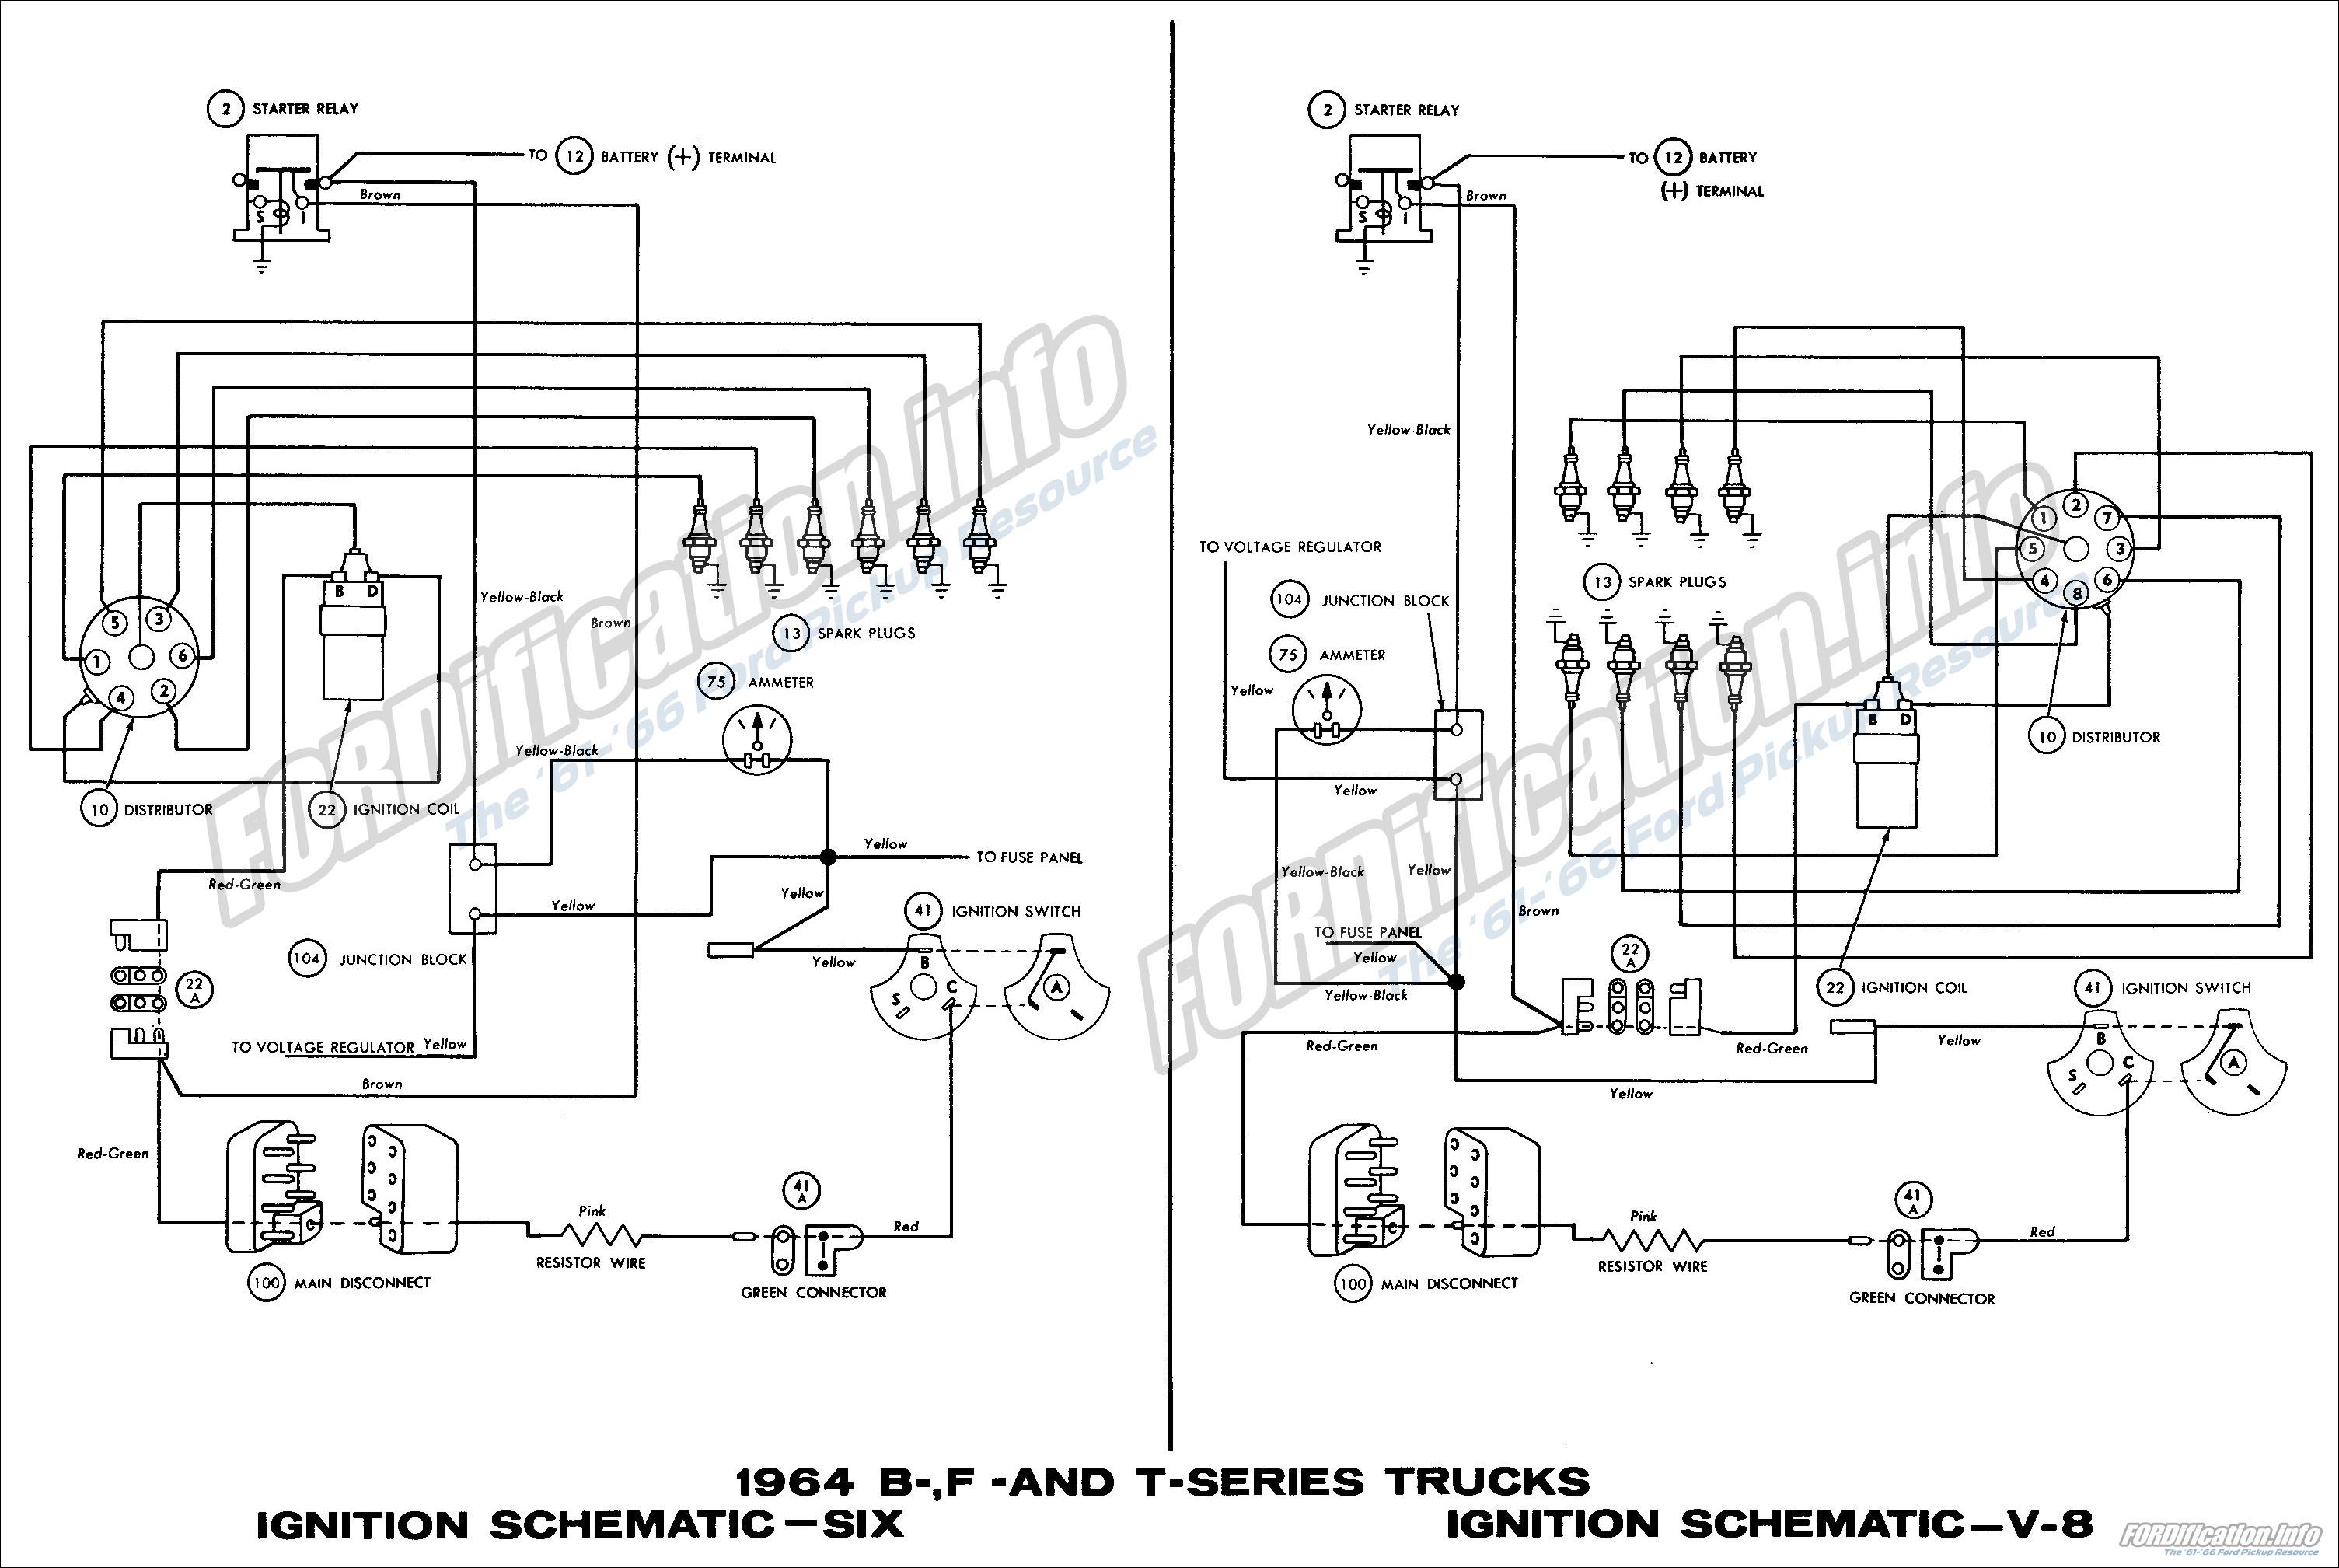 Peachy 1964 Ford F100 Wiring Diagram Basic Electronics Wiring Diagram Wiring Cloud Hemtshollocom